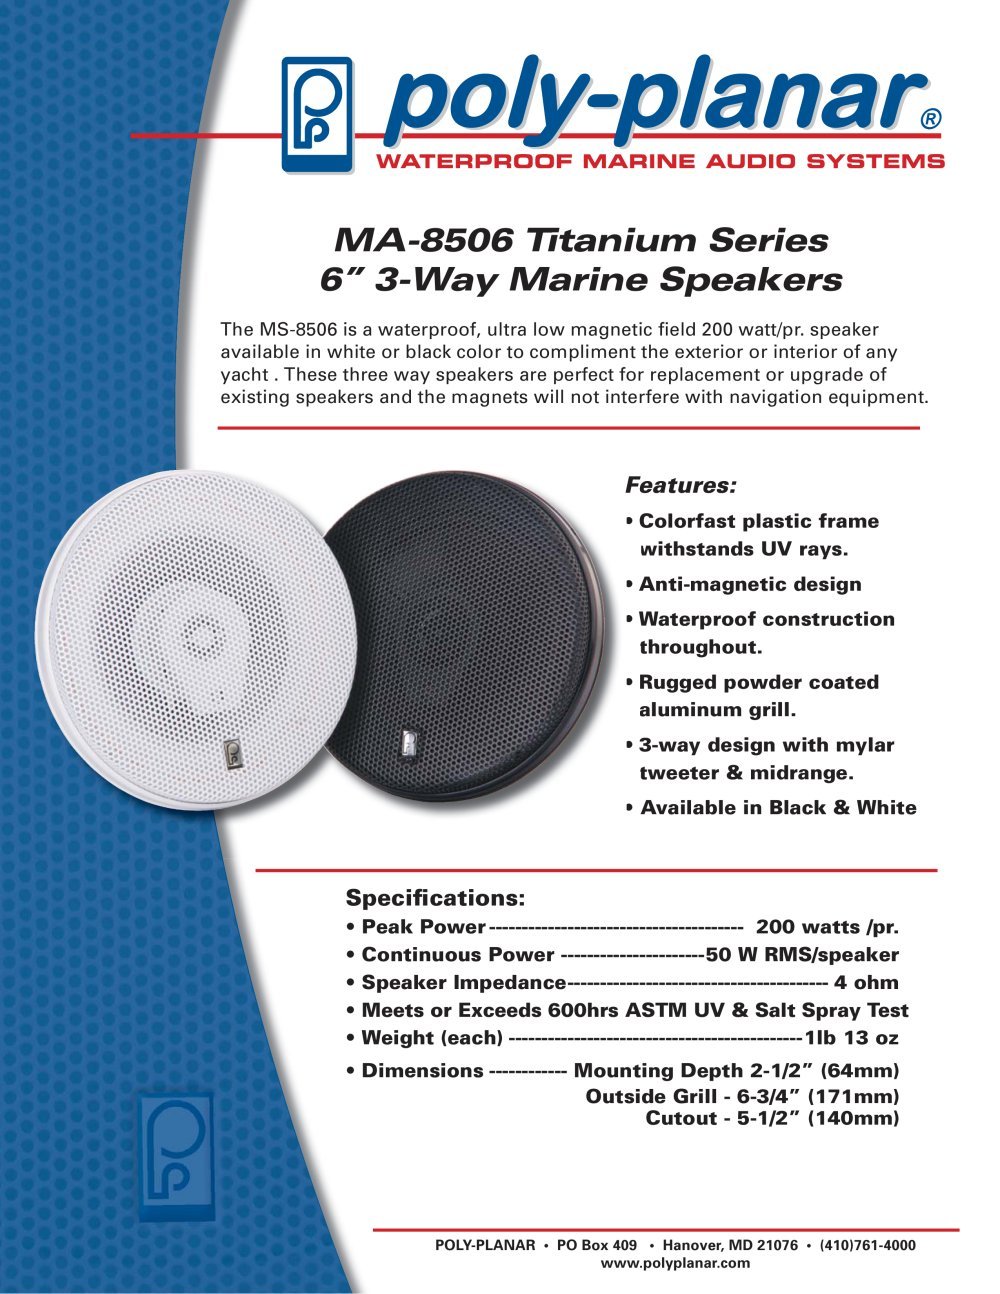 Ma 8506 Titanium Series 6 3 Way Marine Speakers Poly Planar Pdf